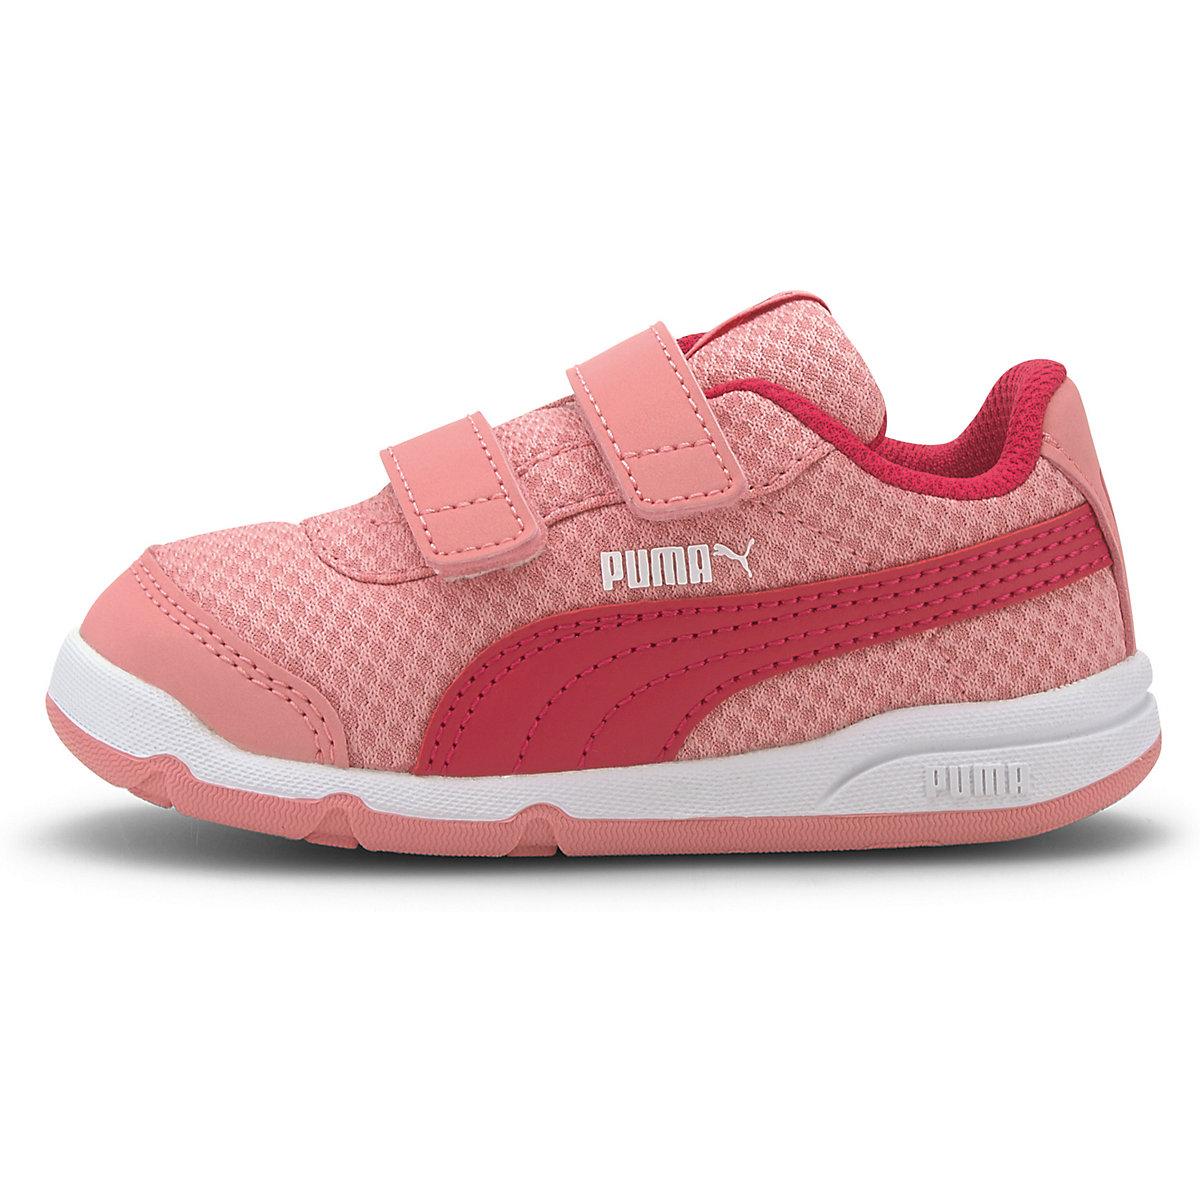 Puma, Sneakers Stepfleex 2 Mesh Ve V Inf Für Mädchen, Rosa